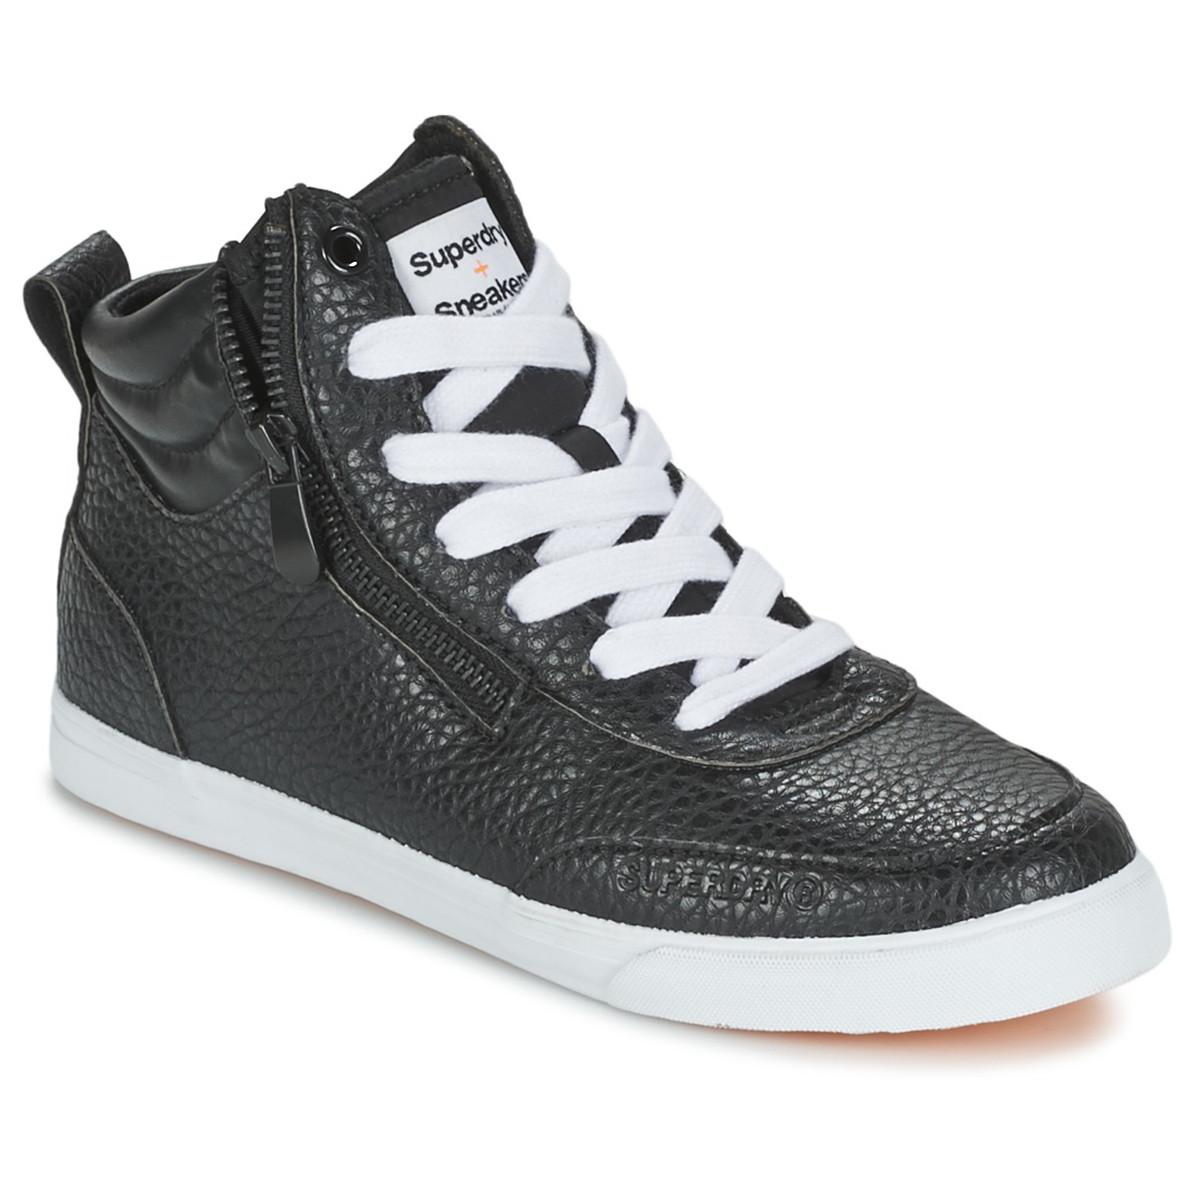 Chaussure Superdry Cher Nano Sneaker Femme Zip Pas Baskets Noir 00pxB